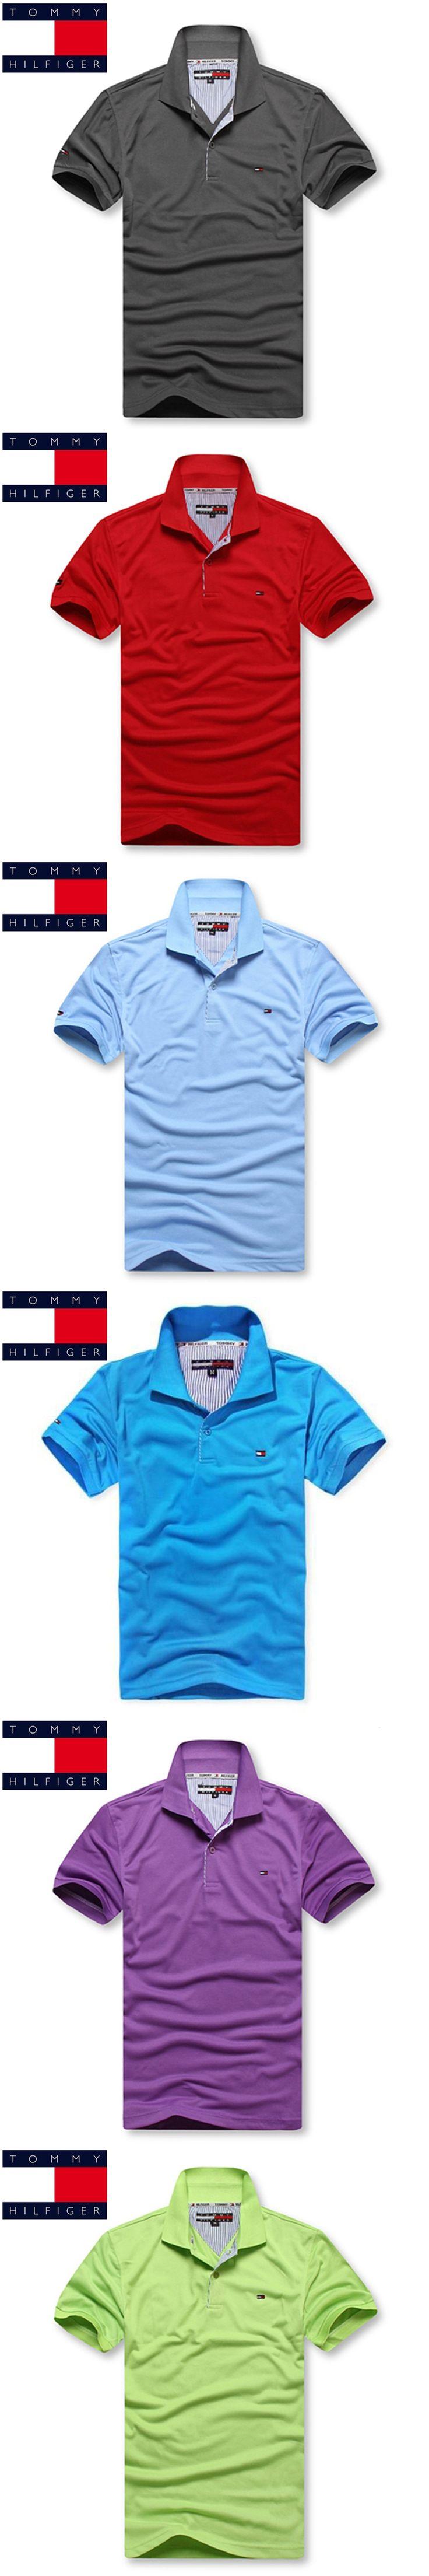 TOMMY HILFIGER Brand New Men's Polo Shirt For Men Desiger Polos Men Short Sleeve shirt clothes jerseys golftennis Plus Size